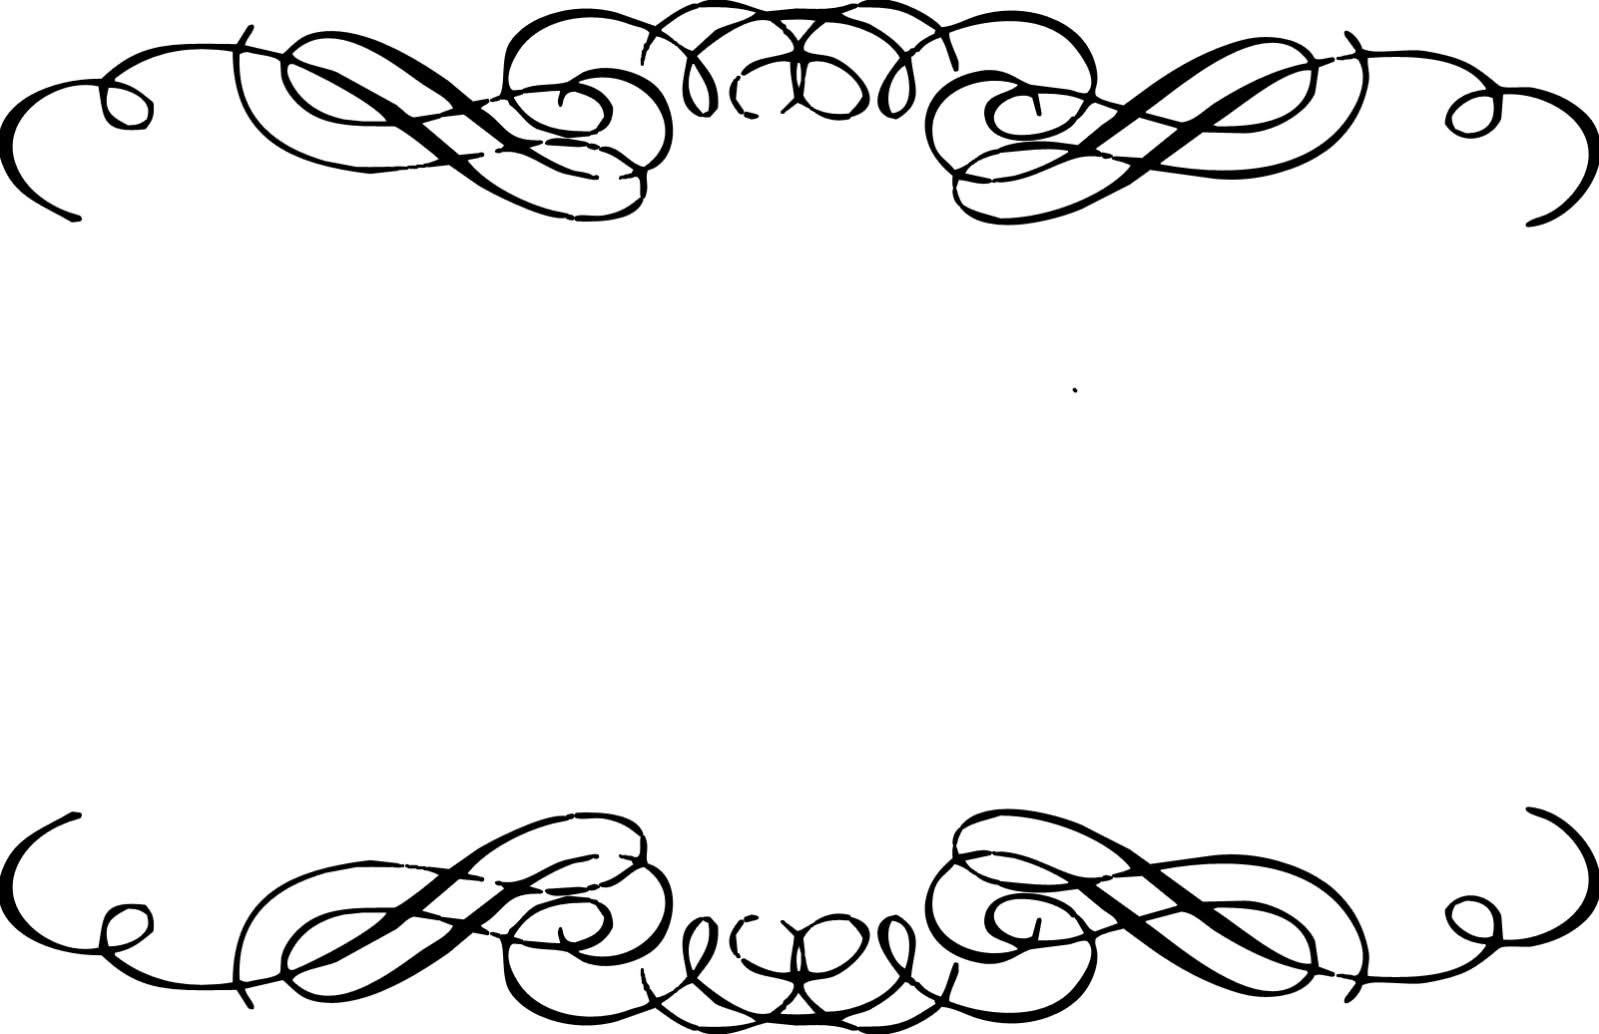 1599x1034 Classy Design Fancy Border Clip Art Corner Scrolls Clipart